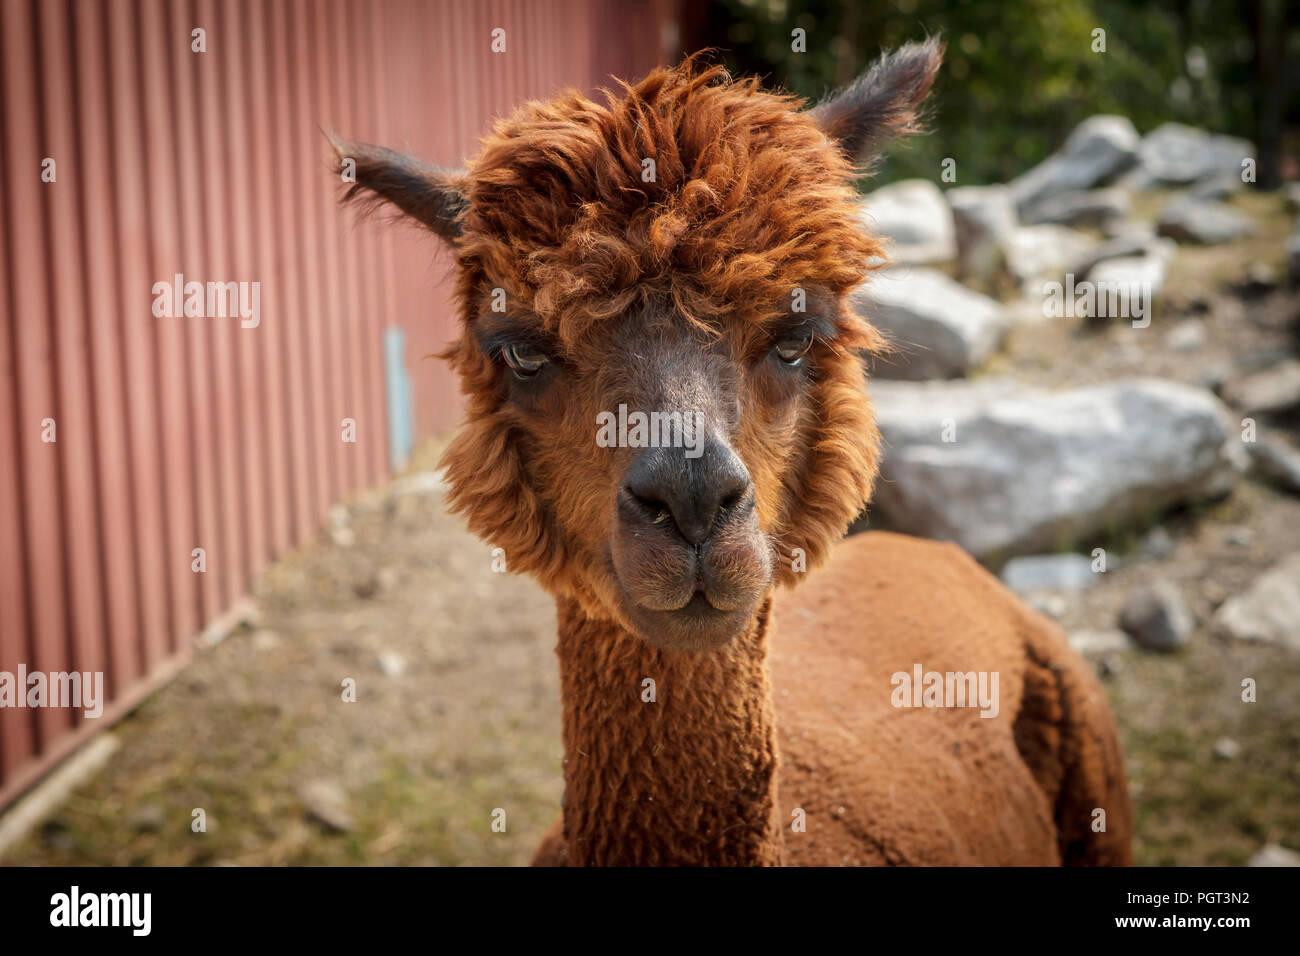 A portrait of a cute reddish brown alpaca in Coeur d'Alene, Idaho. - Stock Image